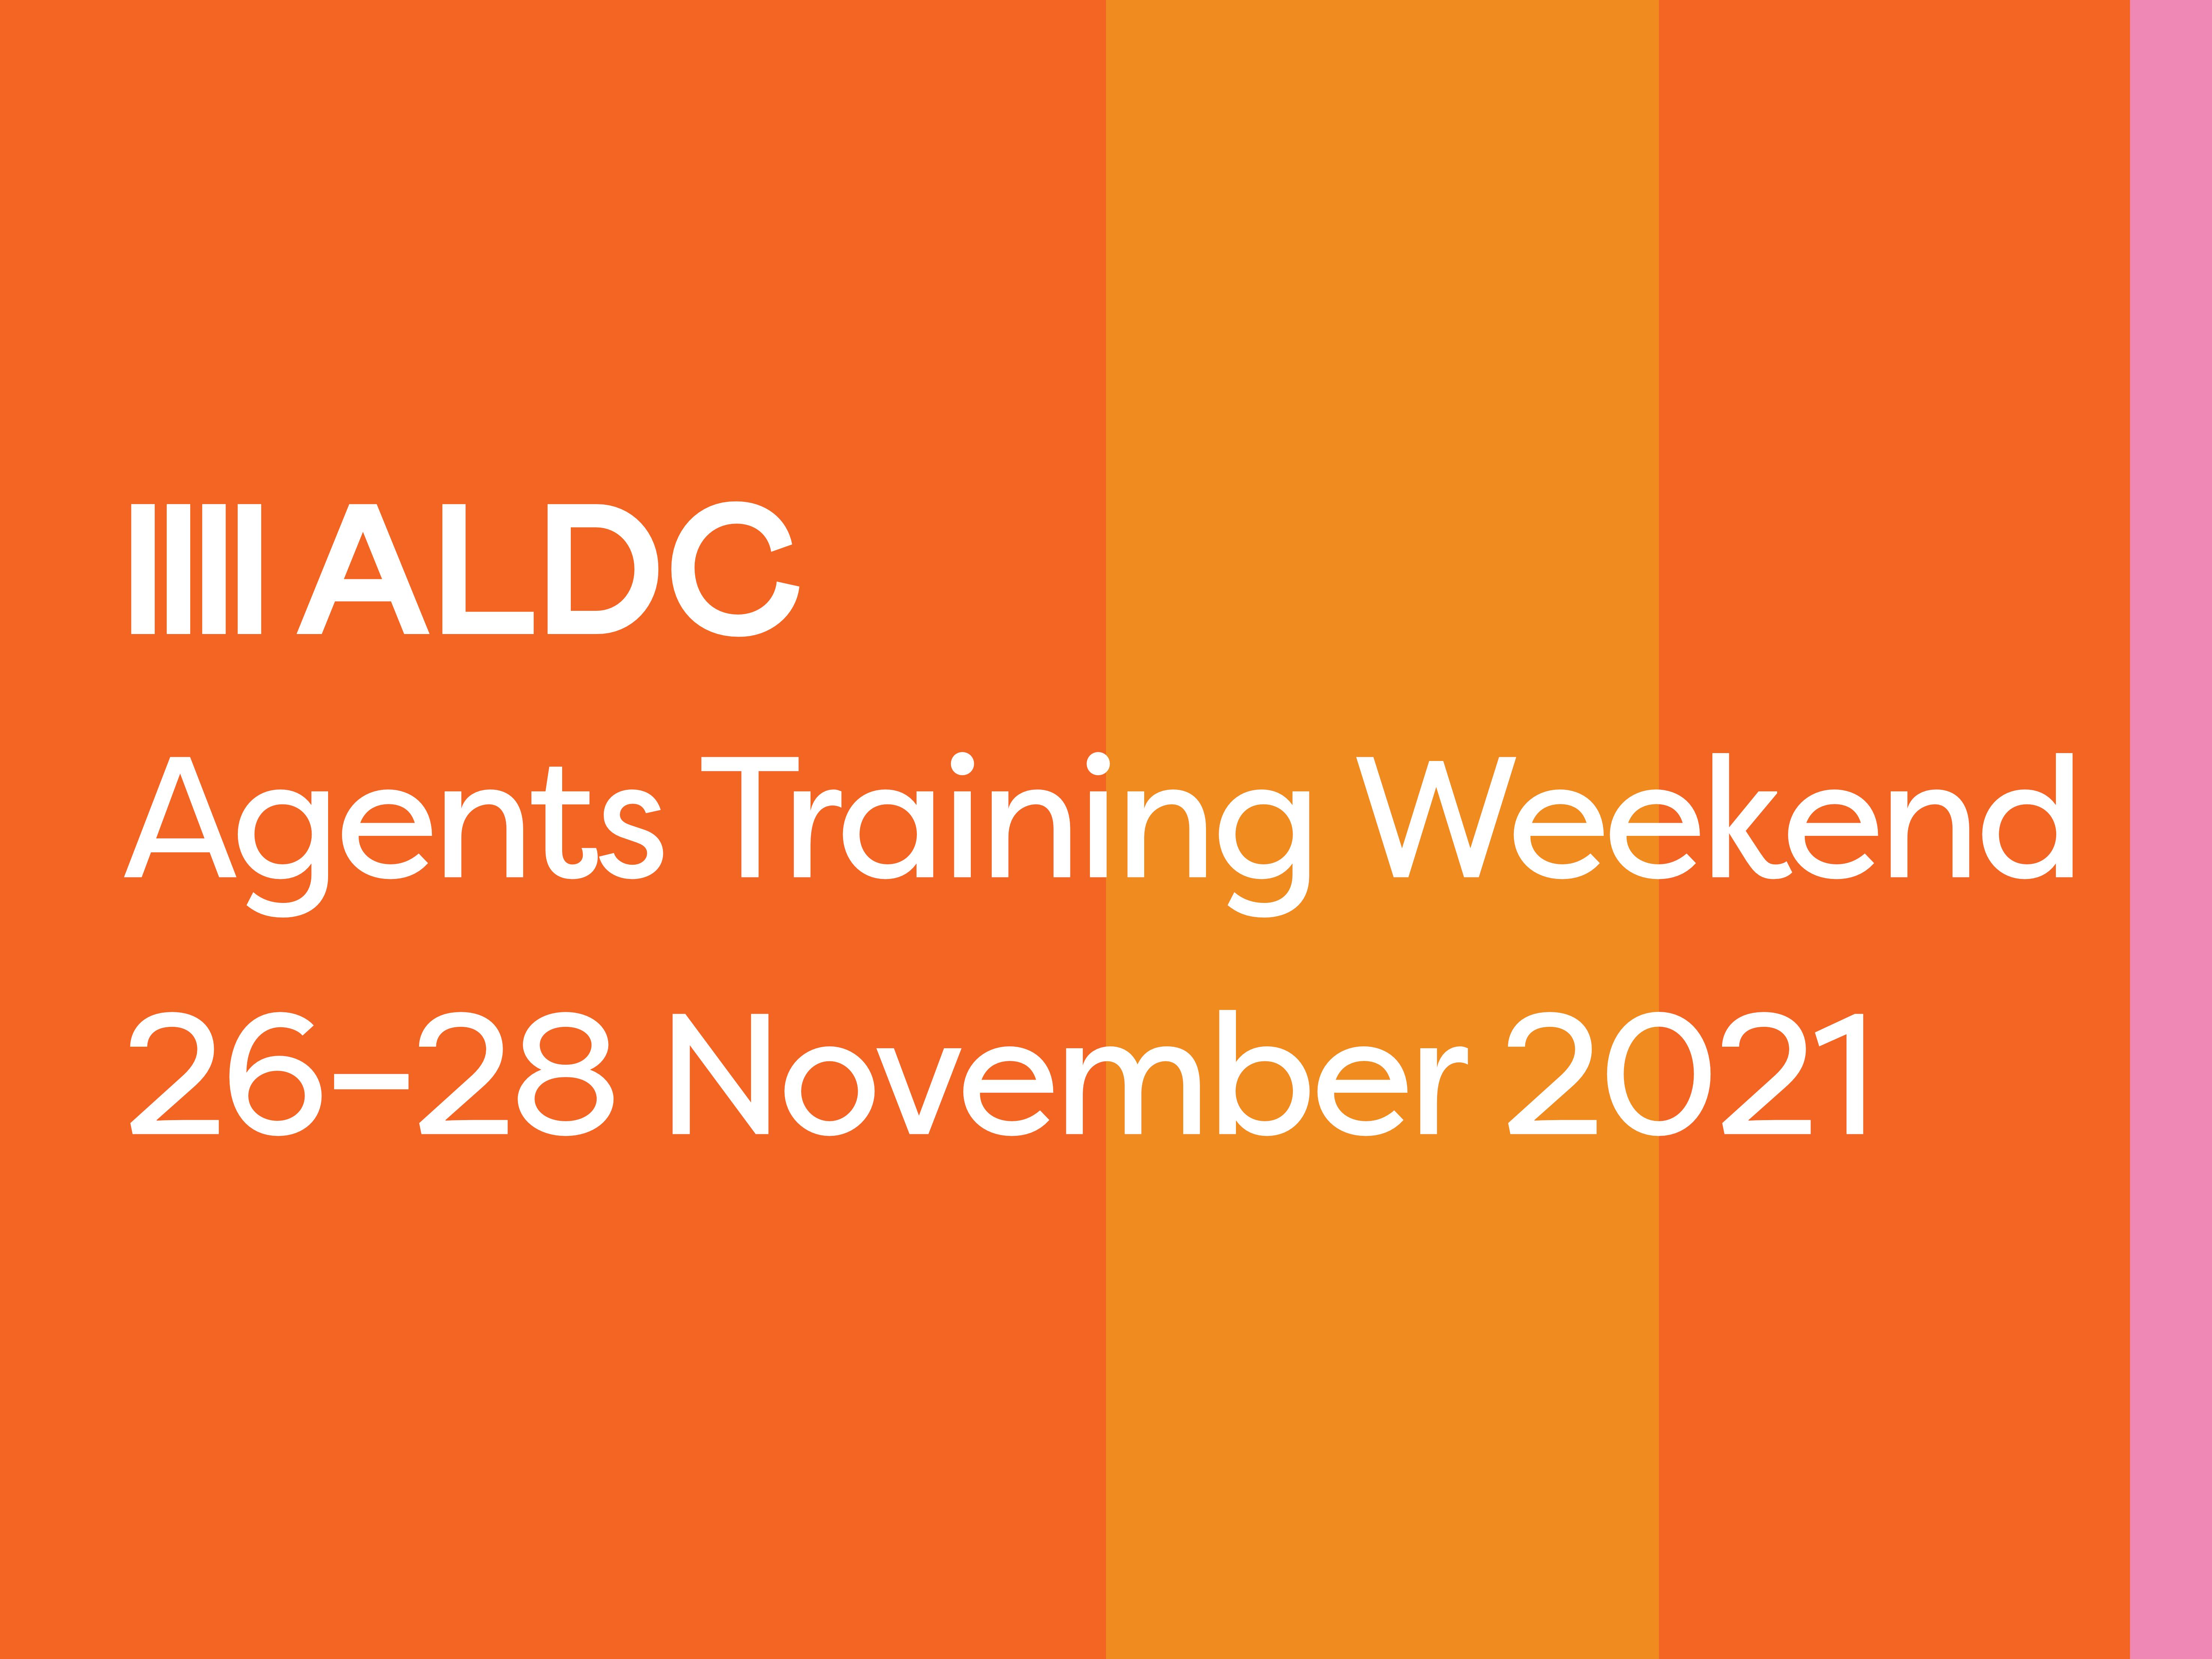 Agents Training Weekend – 26-28 November 2021